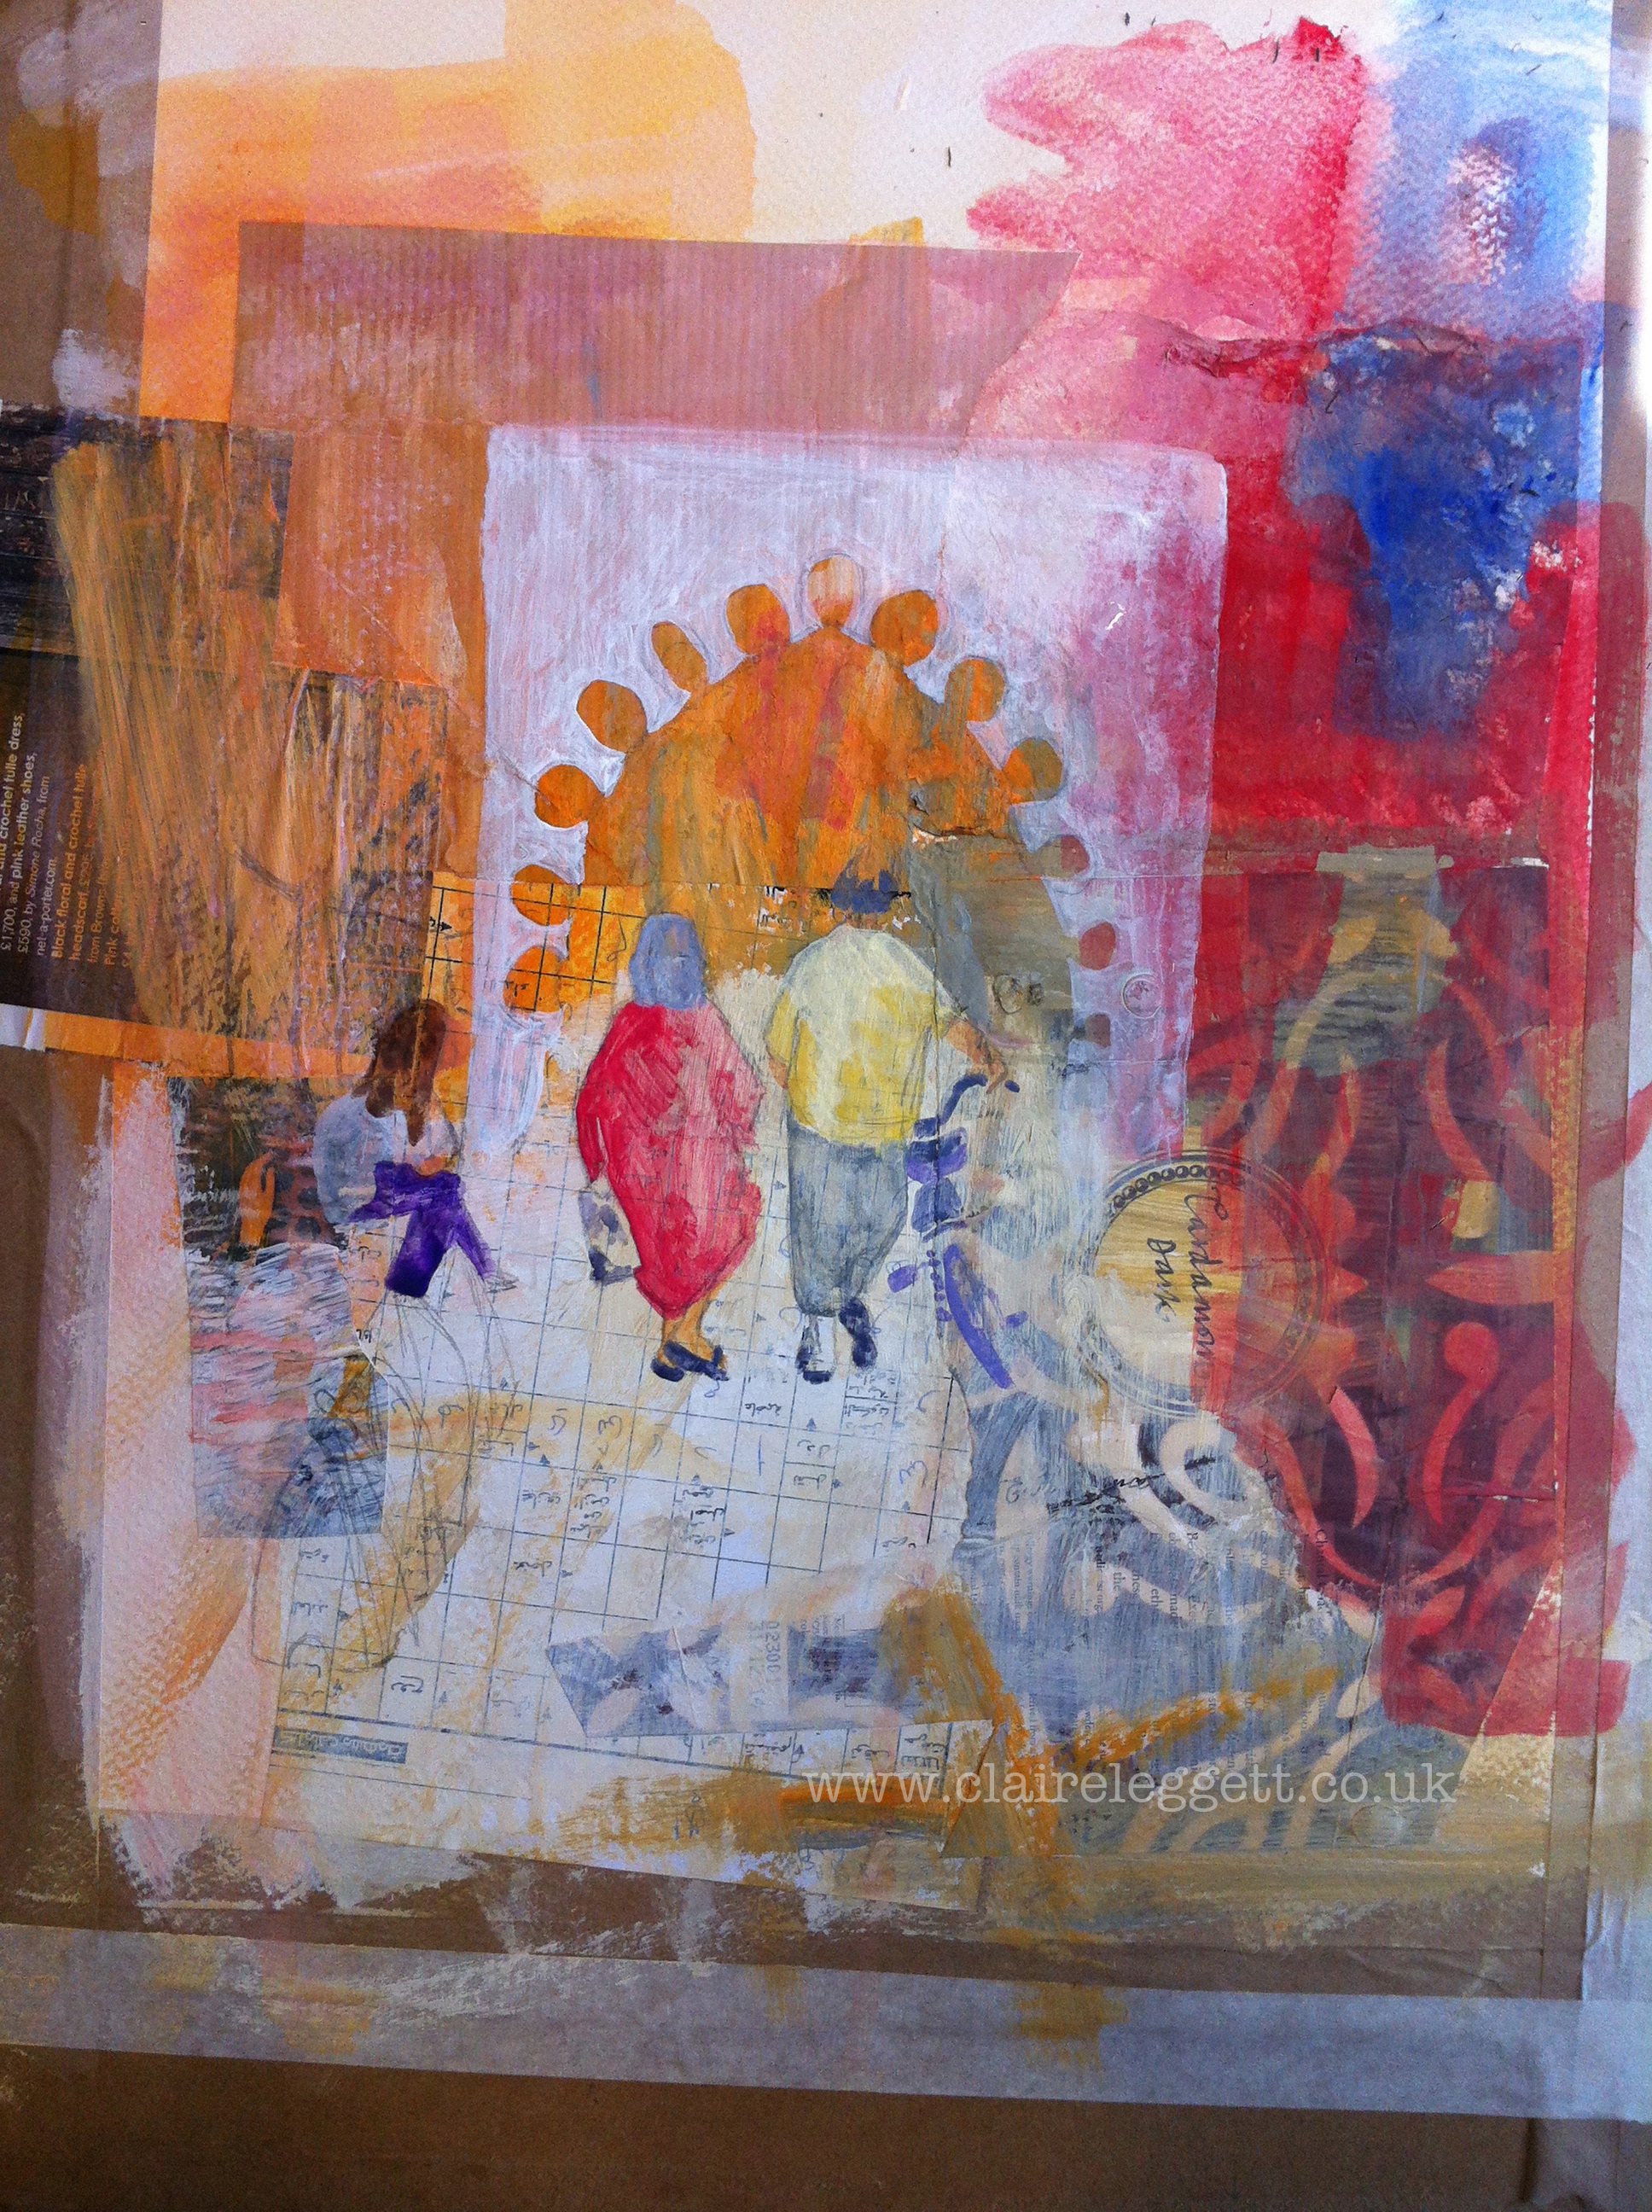 Claire_leggett_painter_early progress